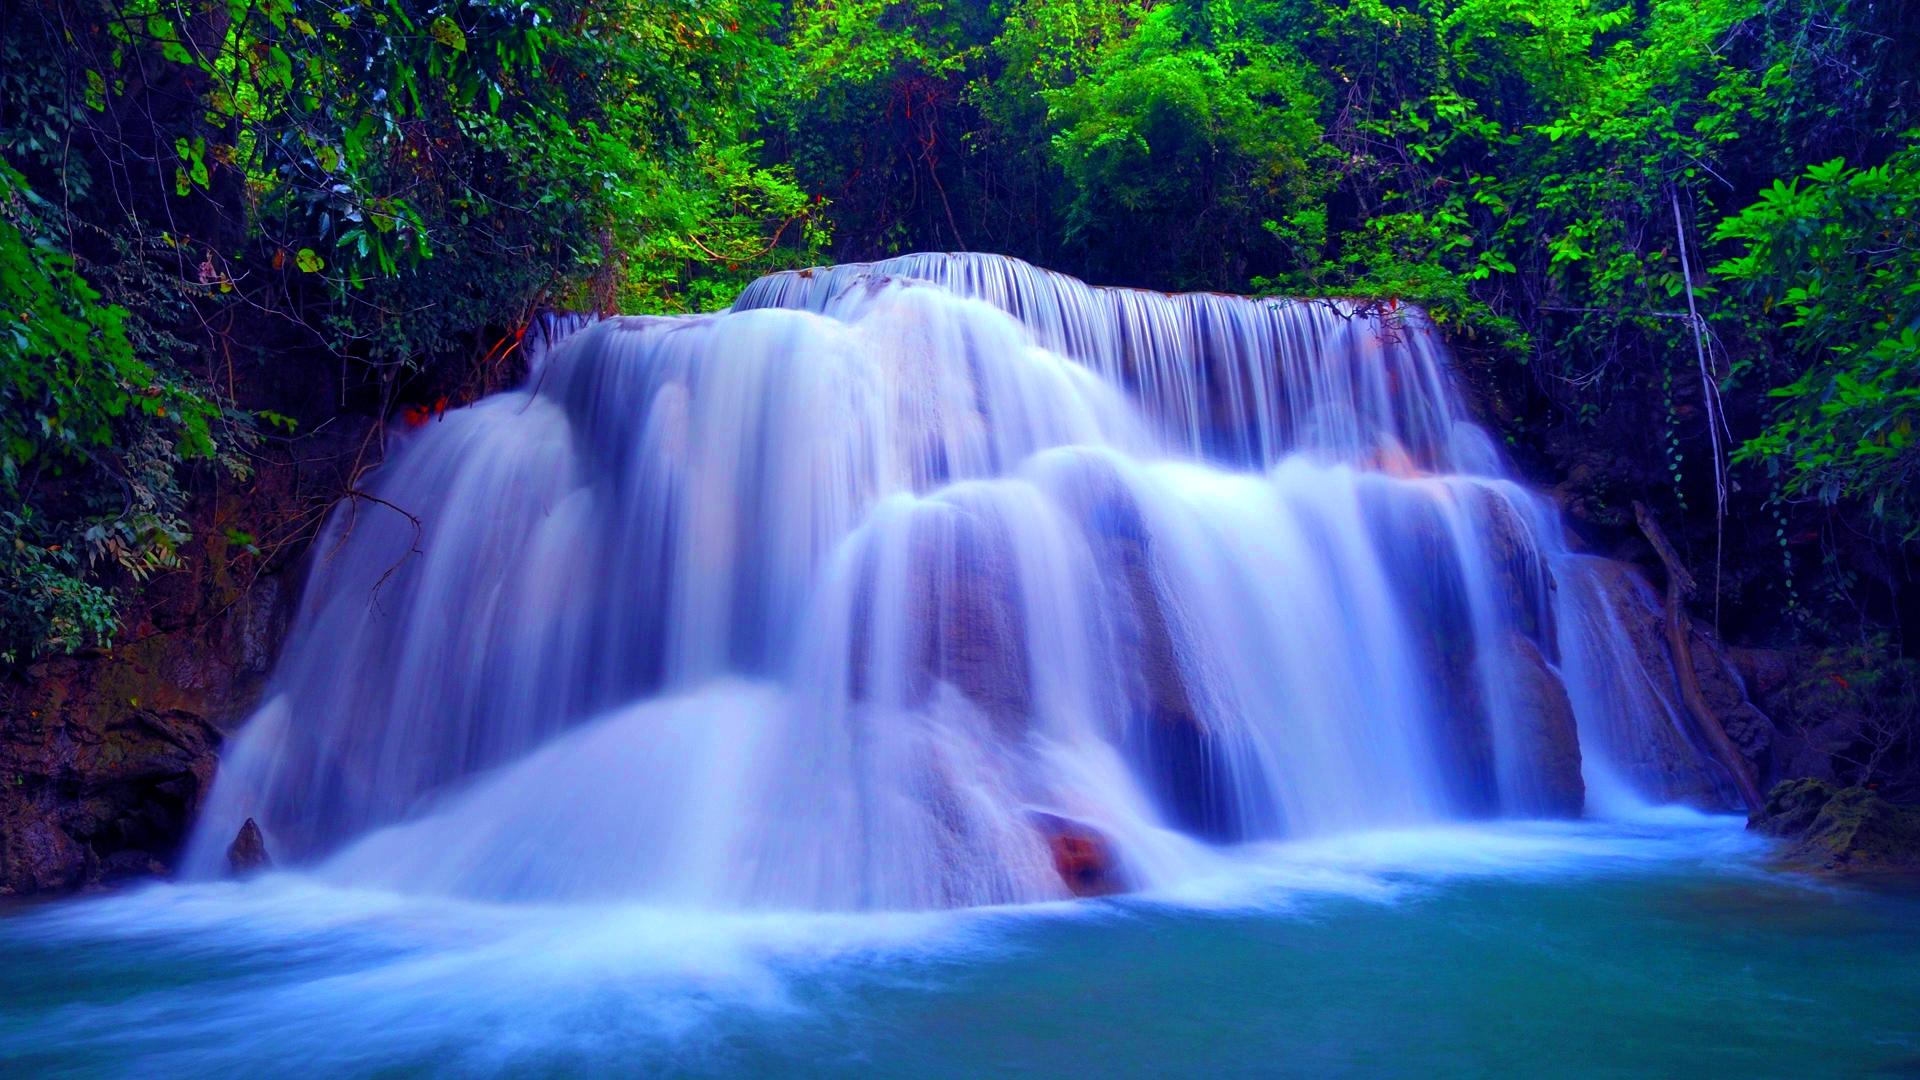 Huay Mae Khamin Waterfall, Kheaun Sri Nakarin National Park, Thailand